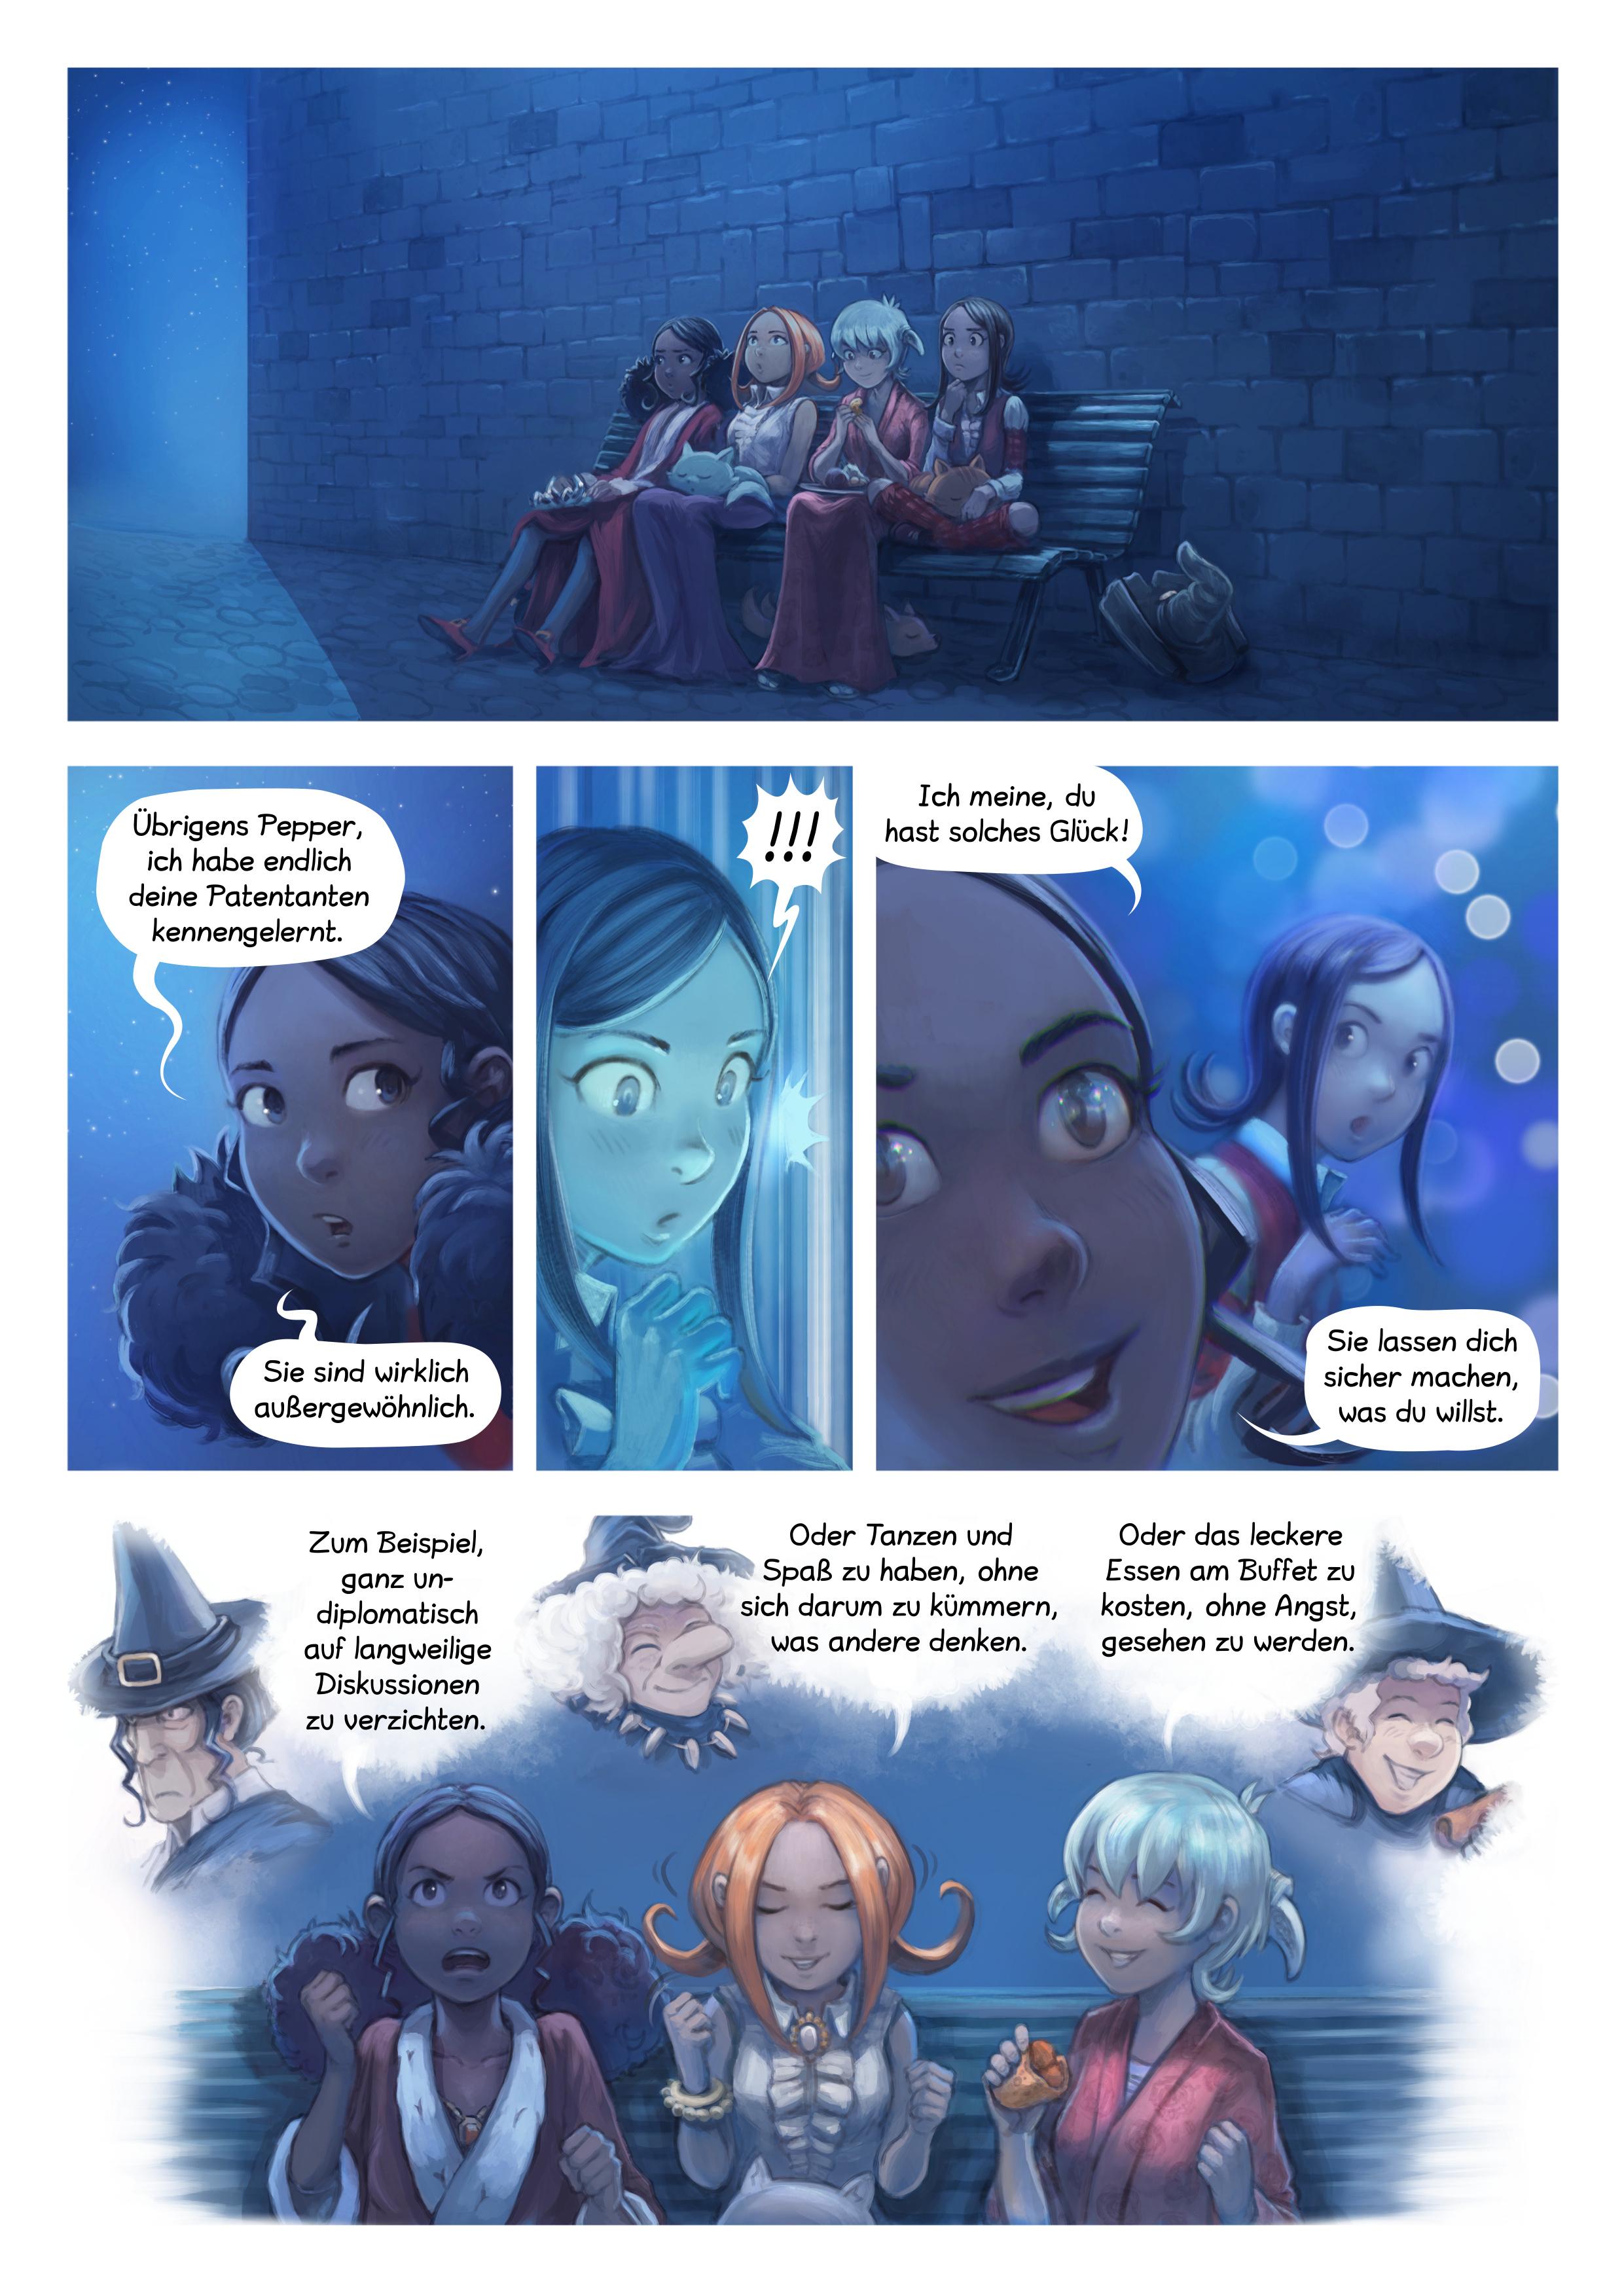 Episode 28: Das Fest, Page 8